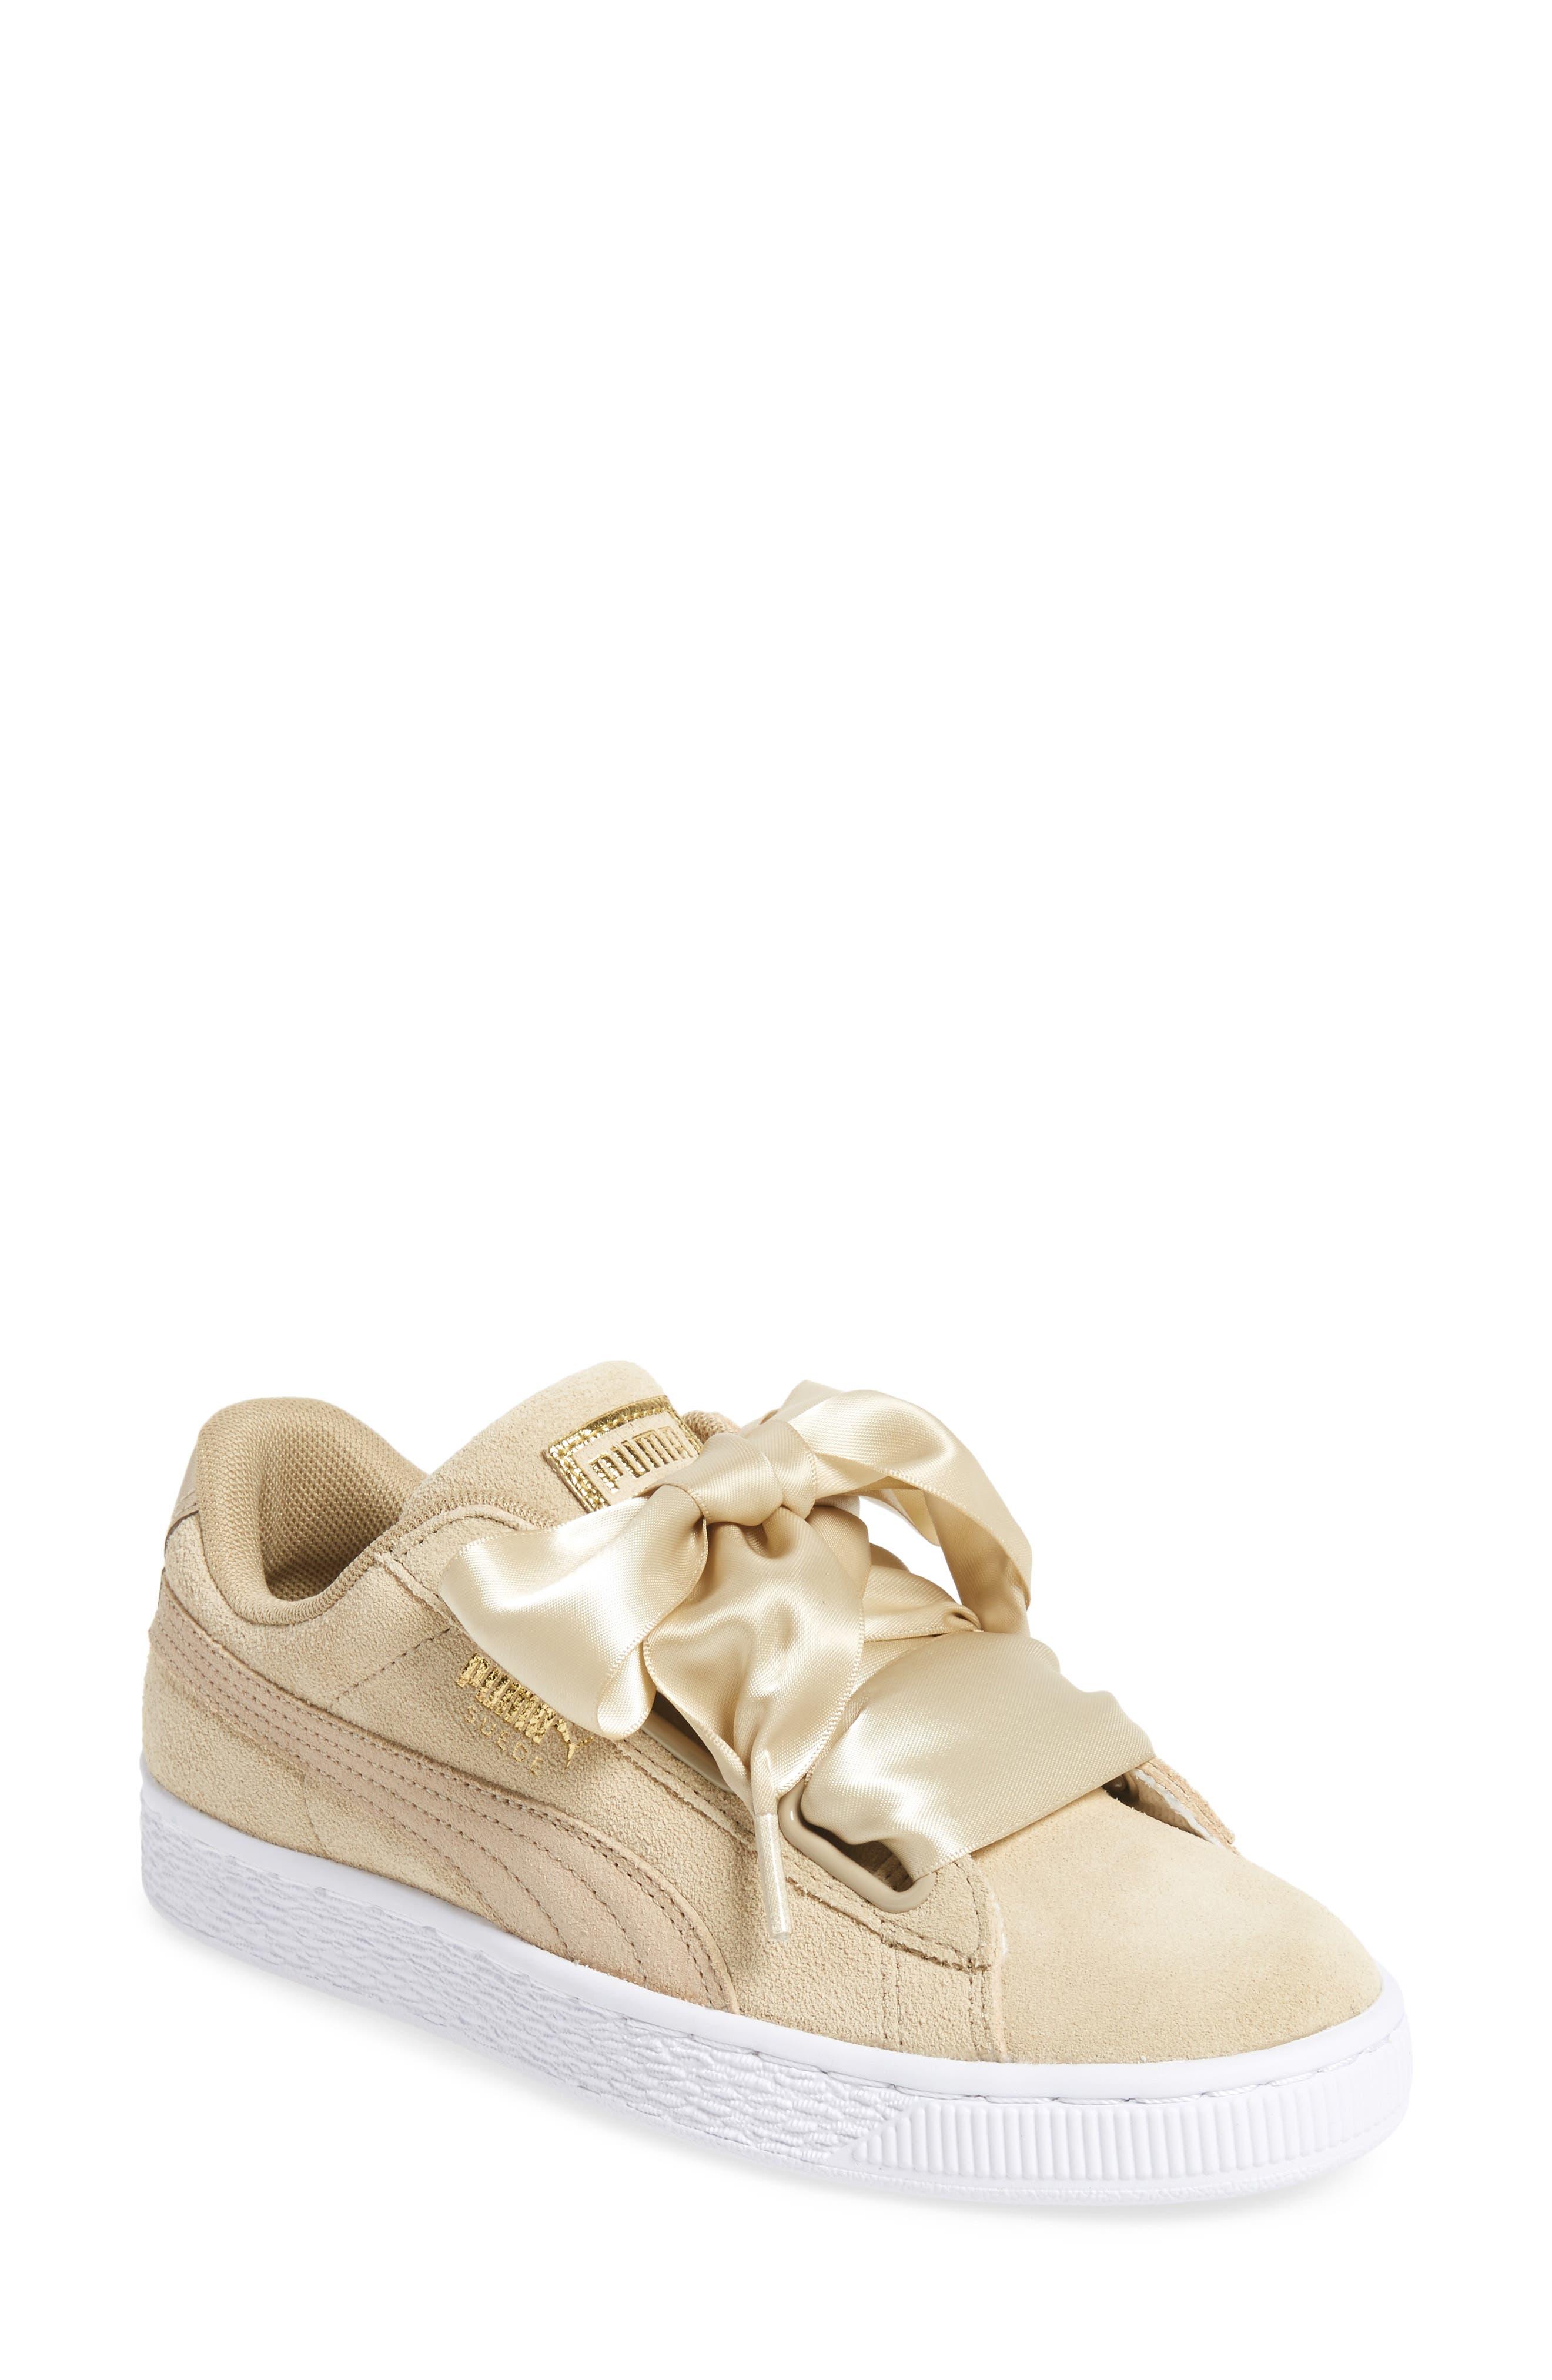 Main Image - Puma Basket Heart Sneaker